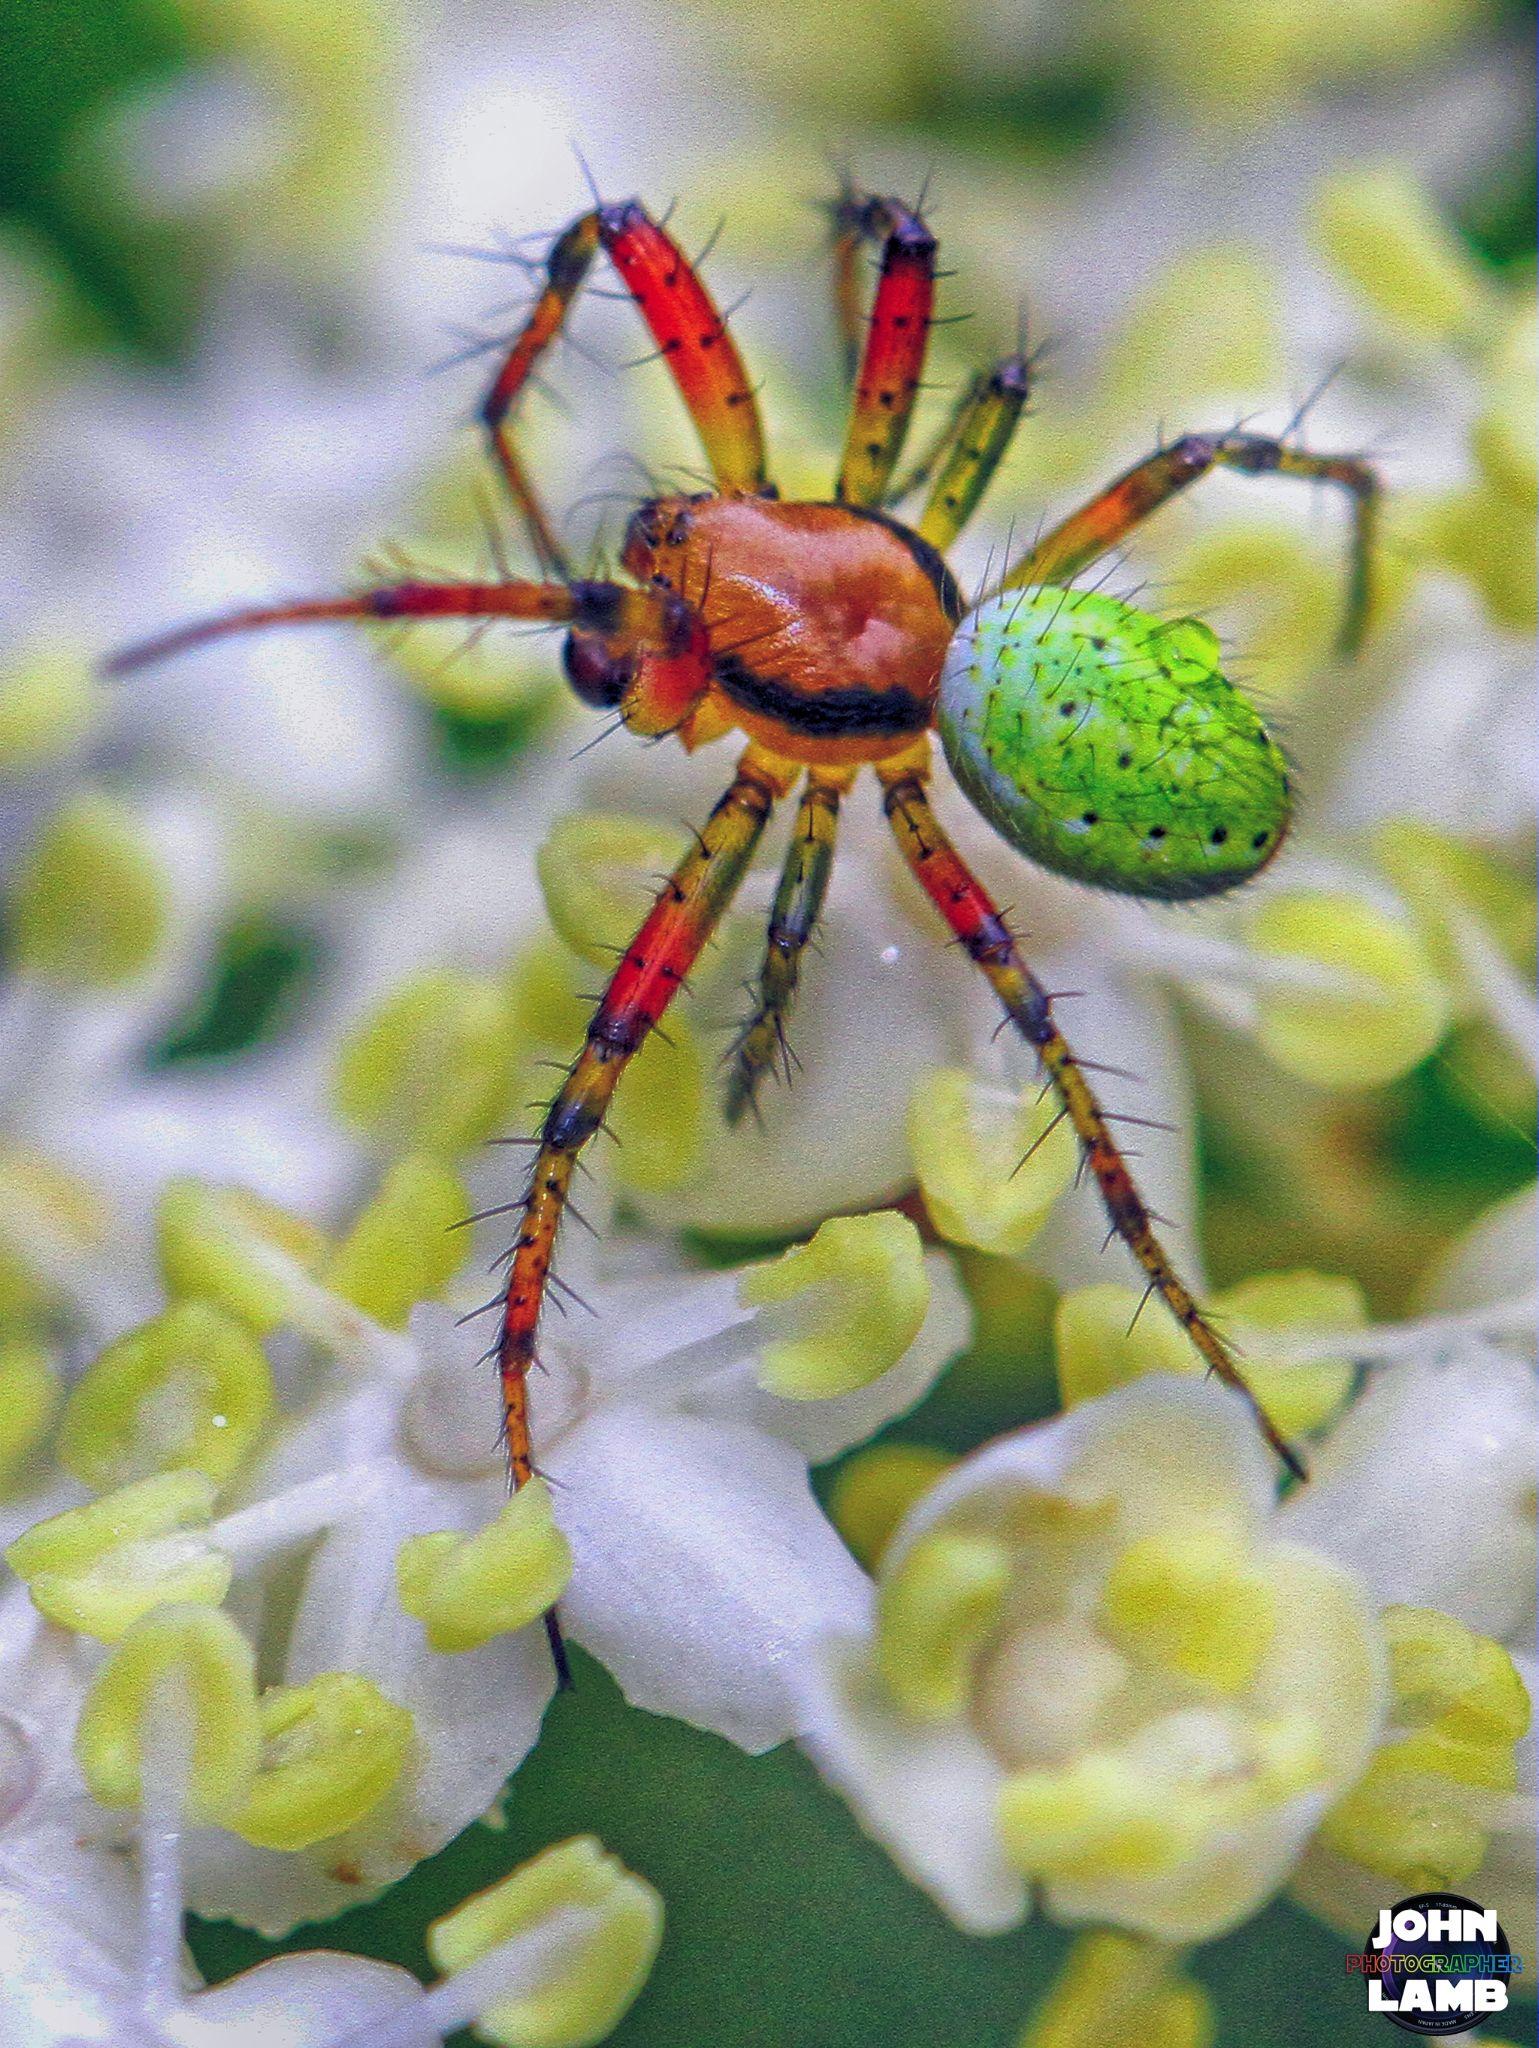 Spider 02 by John Lamb